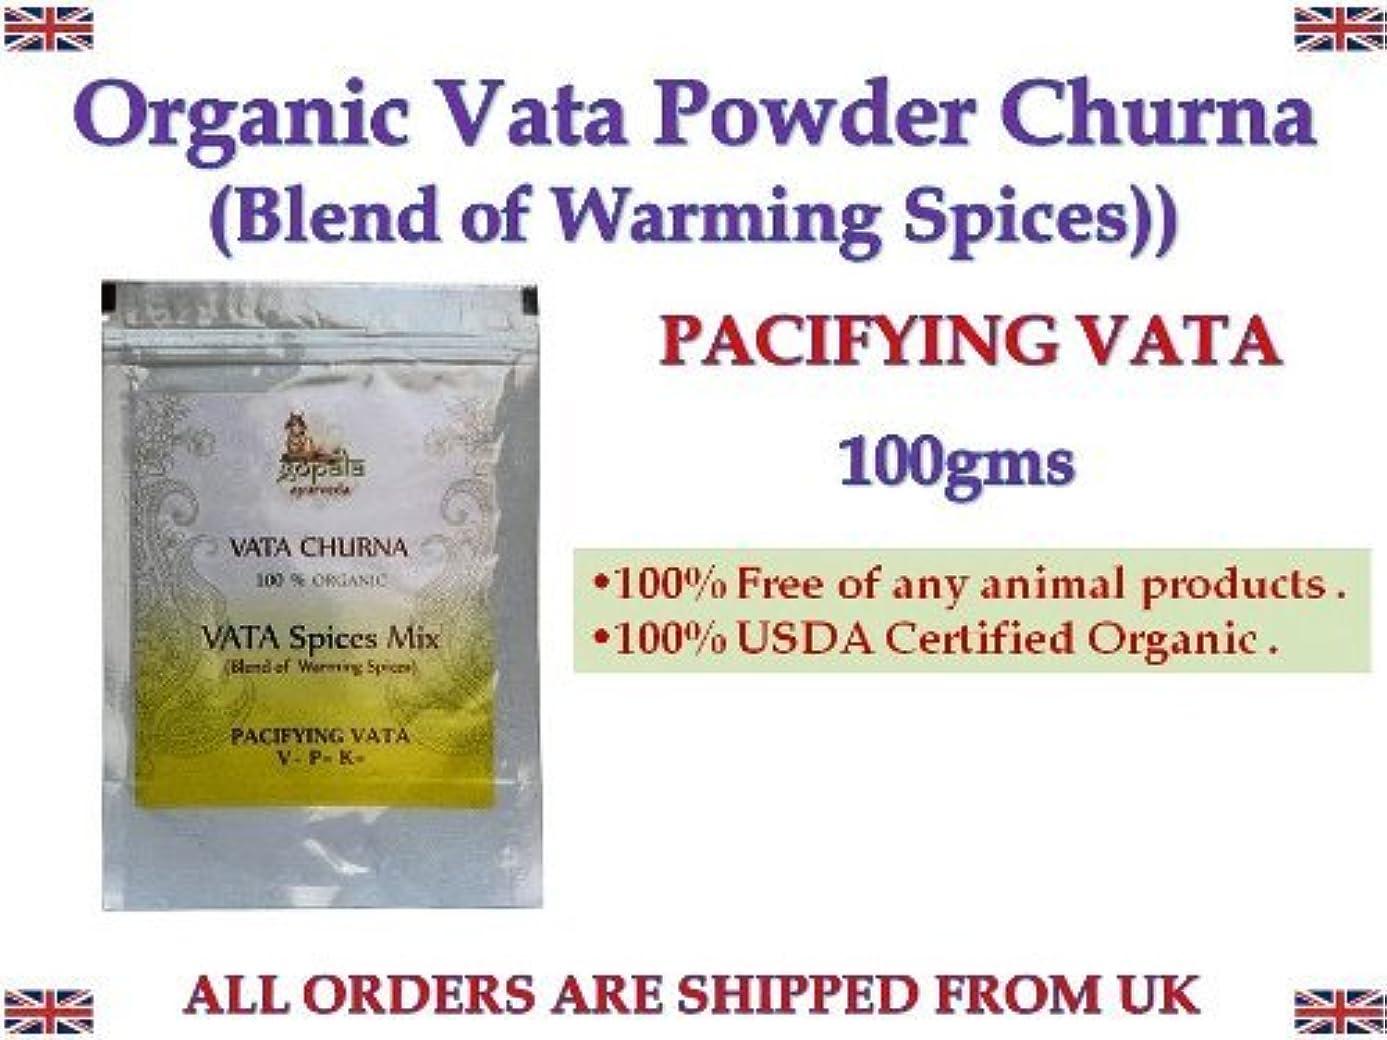 VATA SPICE MIX (POWDER) 100% USDA CERTIFIED ORGANIC - 100gm